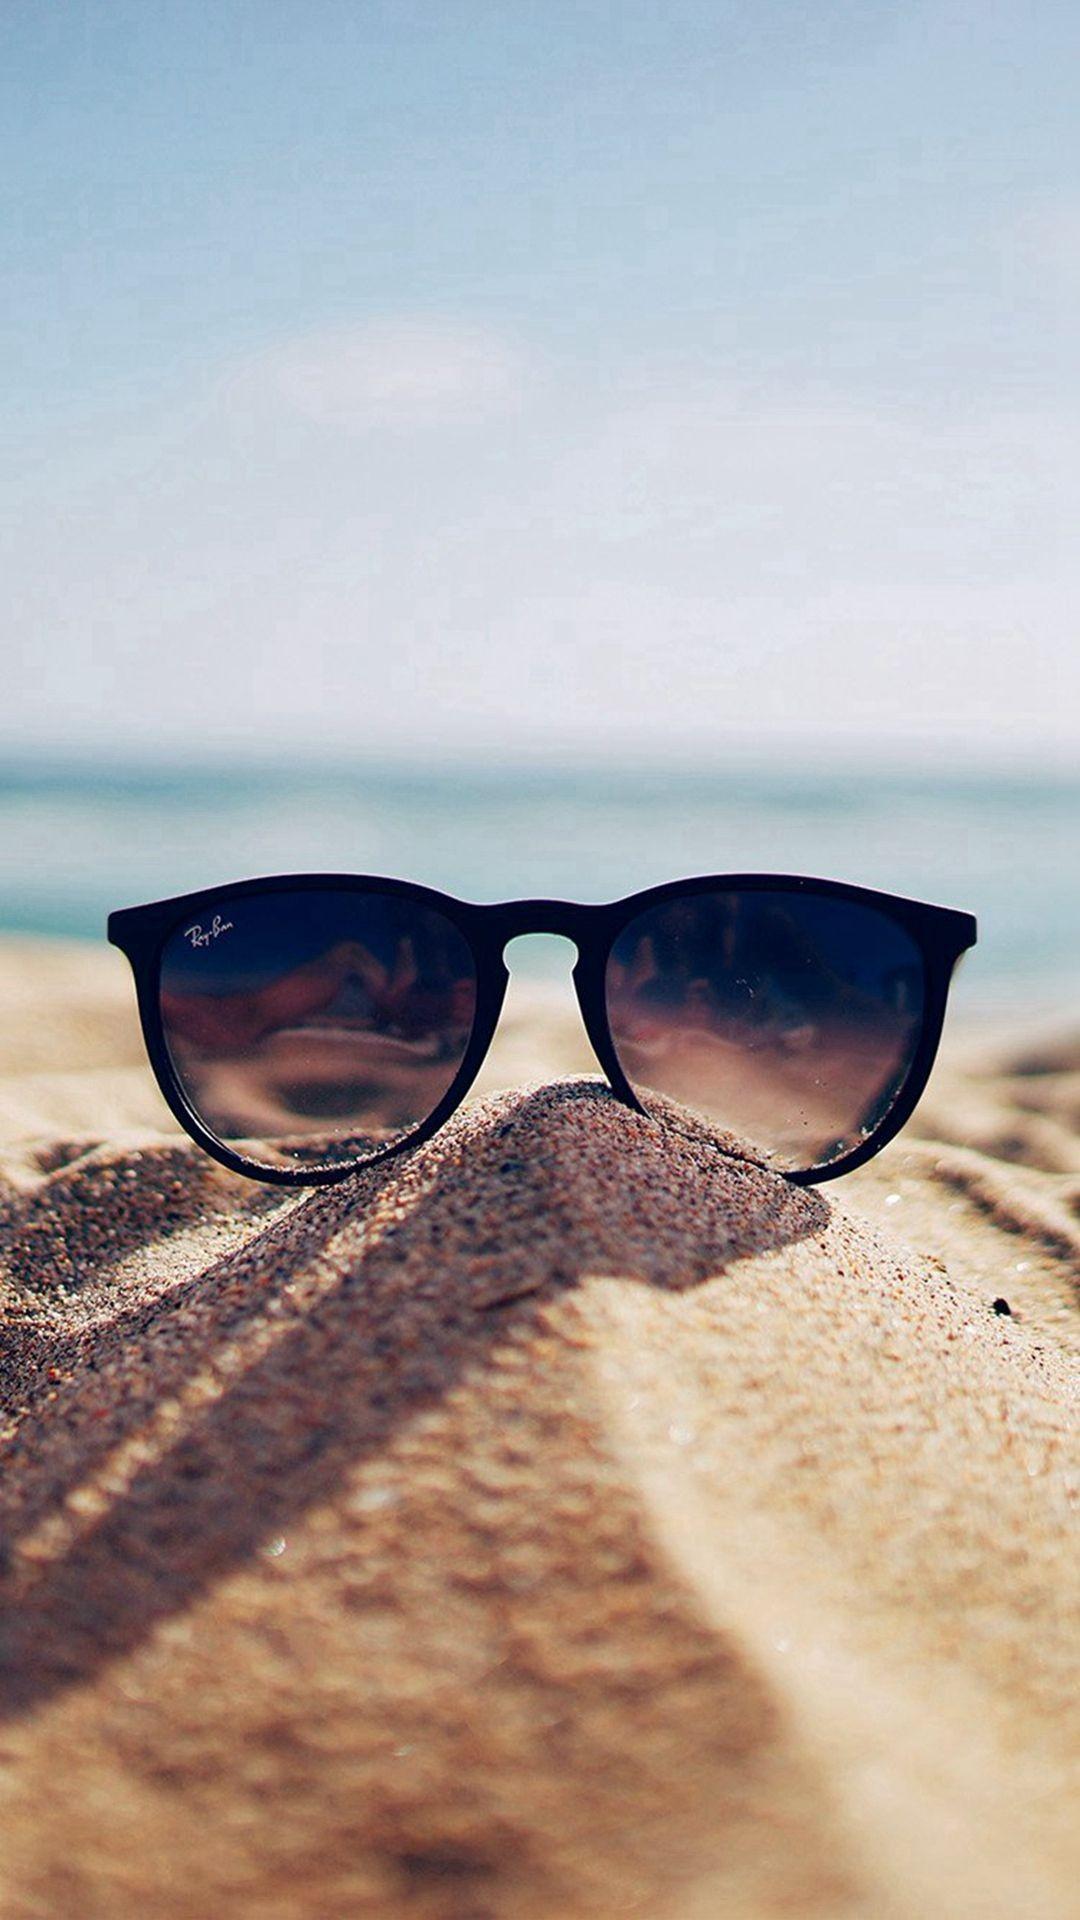 Cool Cat Glasses Iphone 6 Plus Hd Wallpaper Beautiful - Summer Wallpaper Iphone 8 , HD Wallpaper & Backgrounds